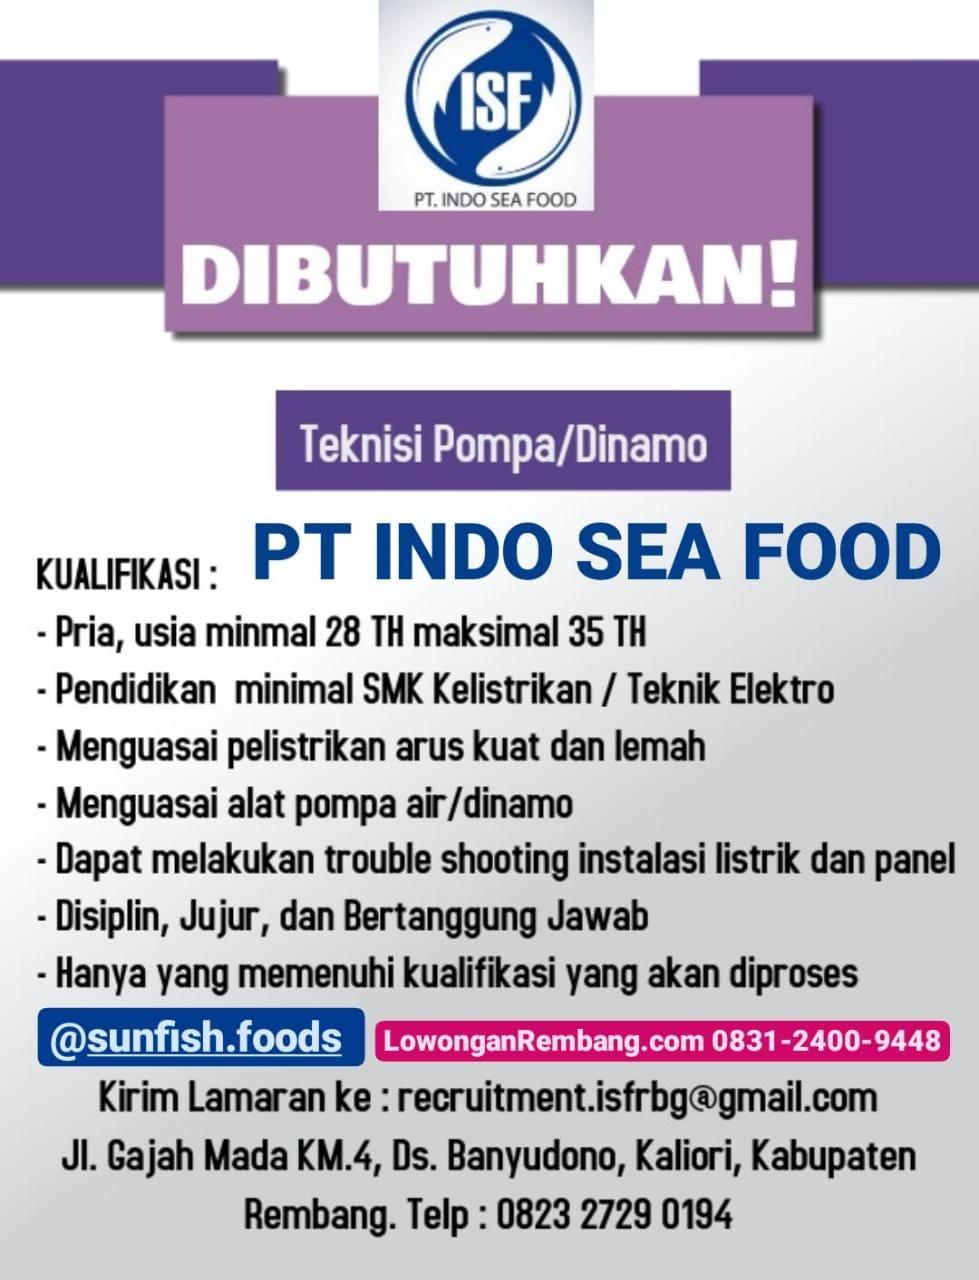 Lowongan Kerja Teknisi Pompa Dinamo PT Indo Sea Food Desa Banyudono Kecamatan Kaliori Kabupaten Rembang